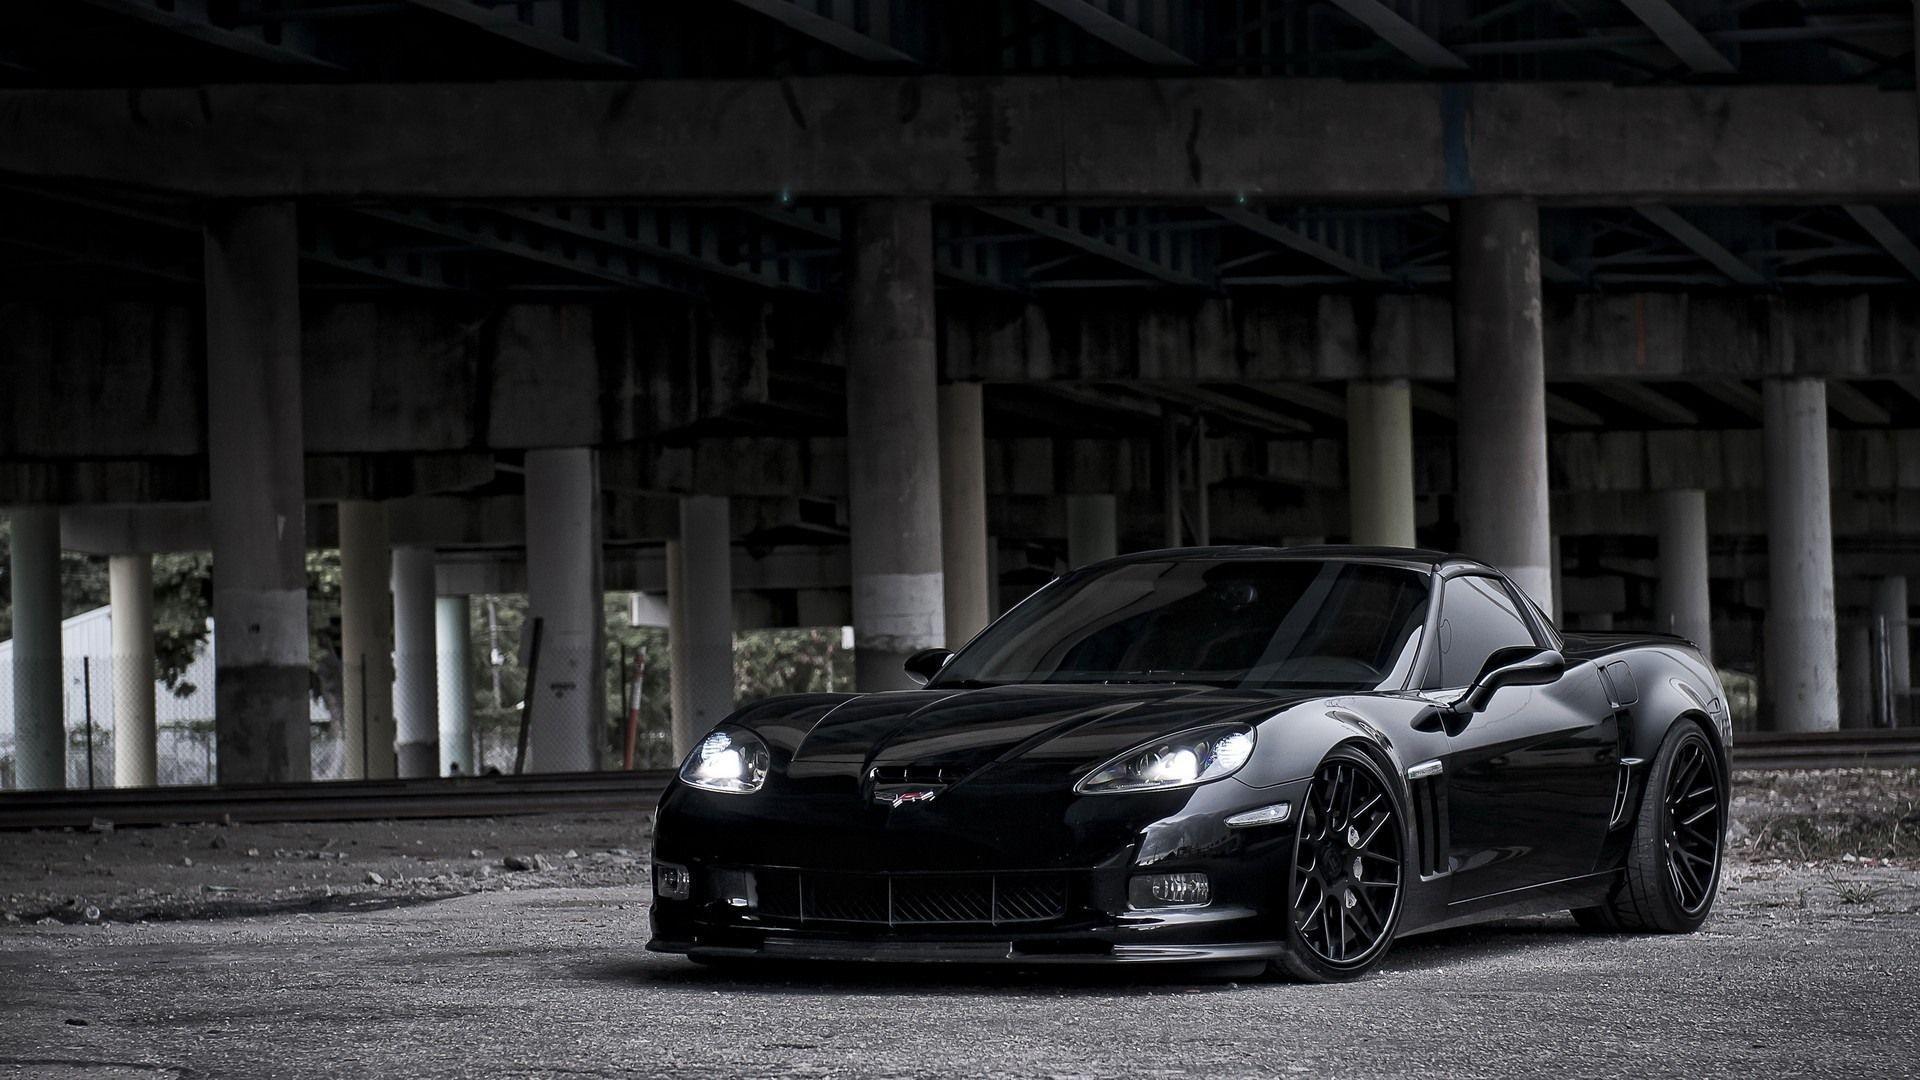 Corvette Wallpapers Top Free Corvette Backgrounds Wallpaperaccess